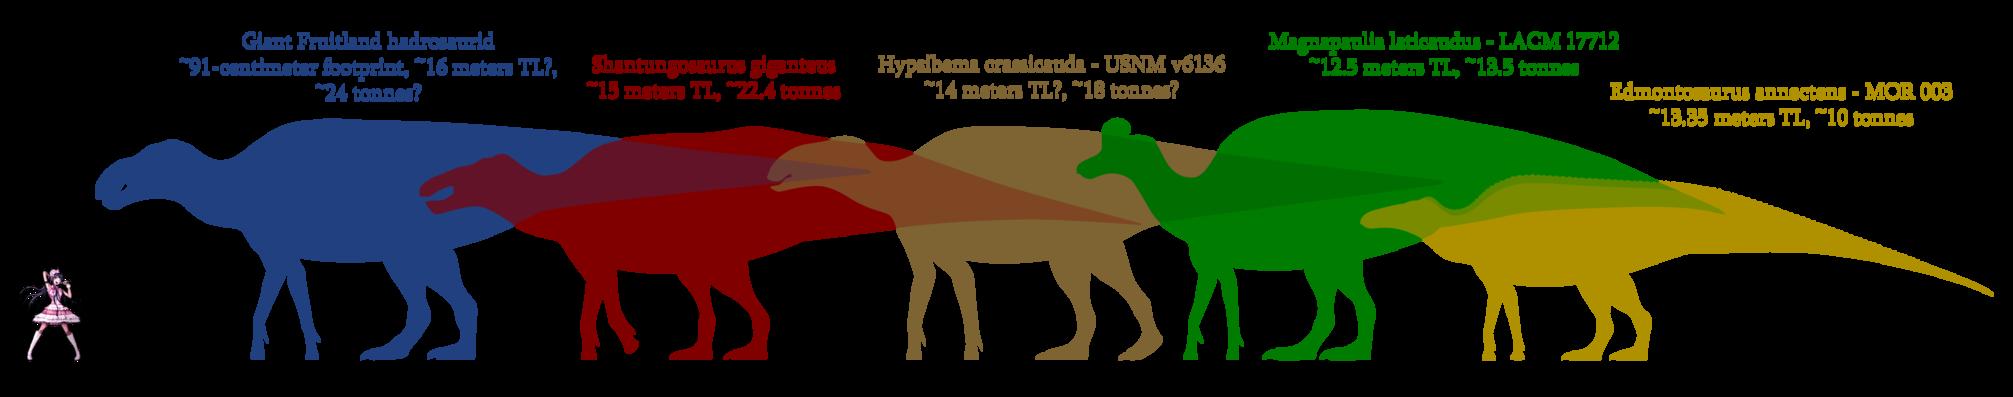 Footprint clipart camel. Keehsay s deviantart favourites